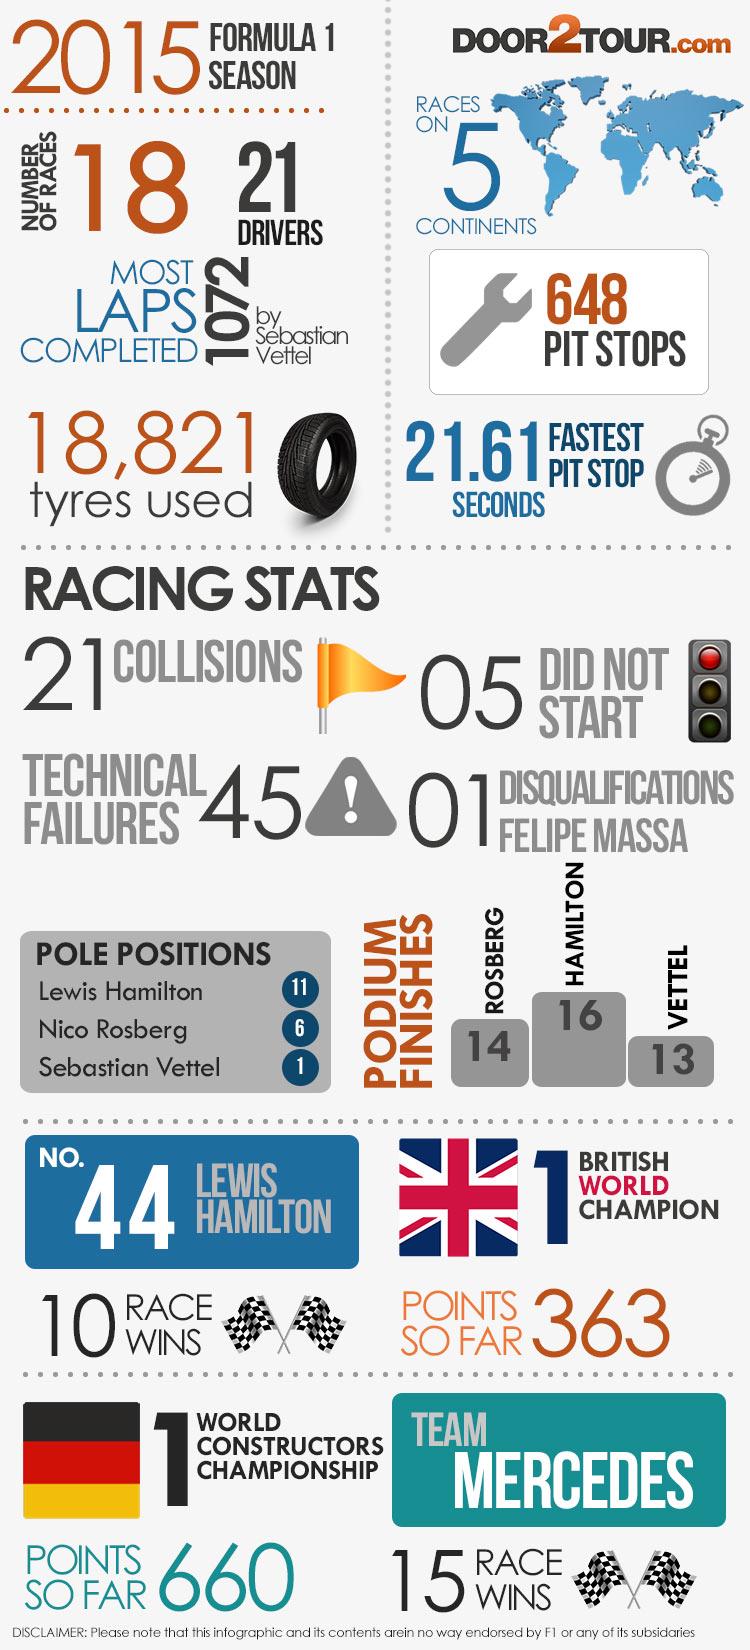 F1 Infographic - Door2Tour.com